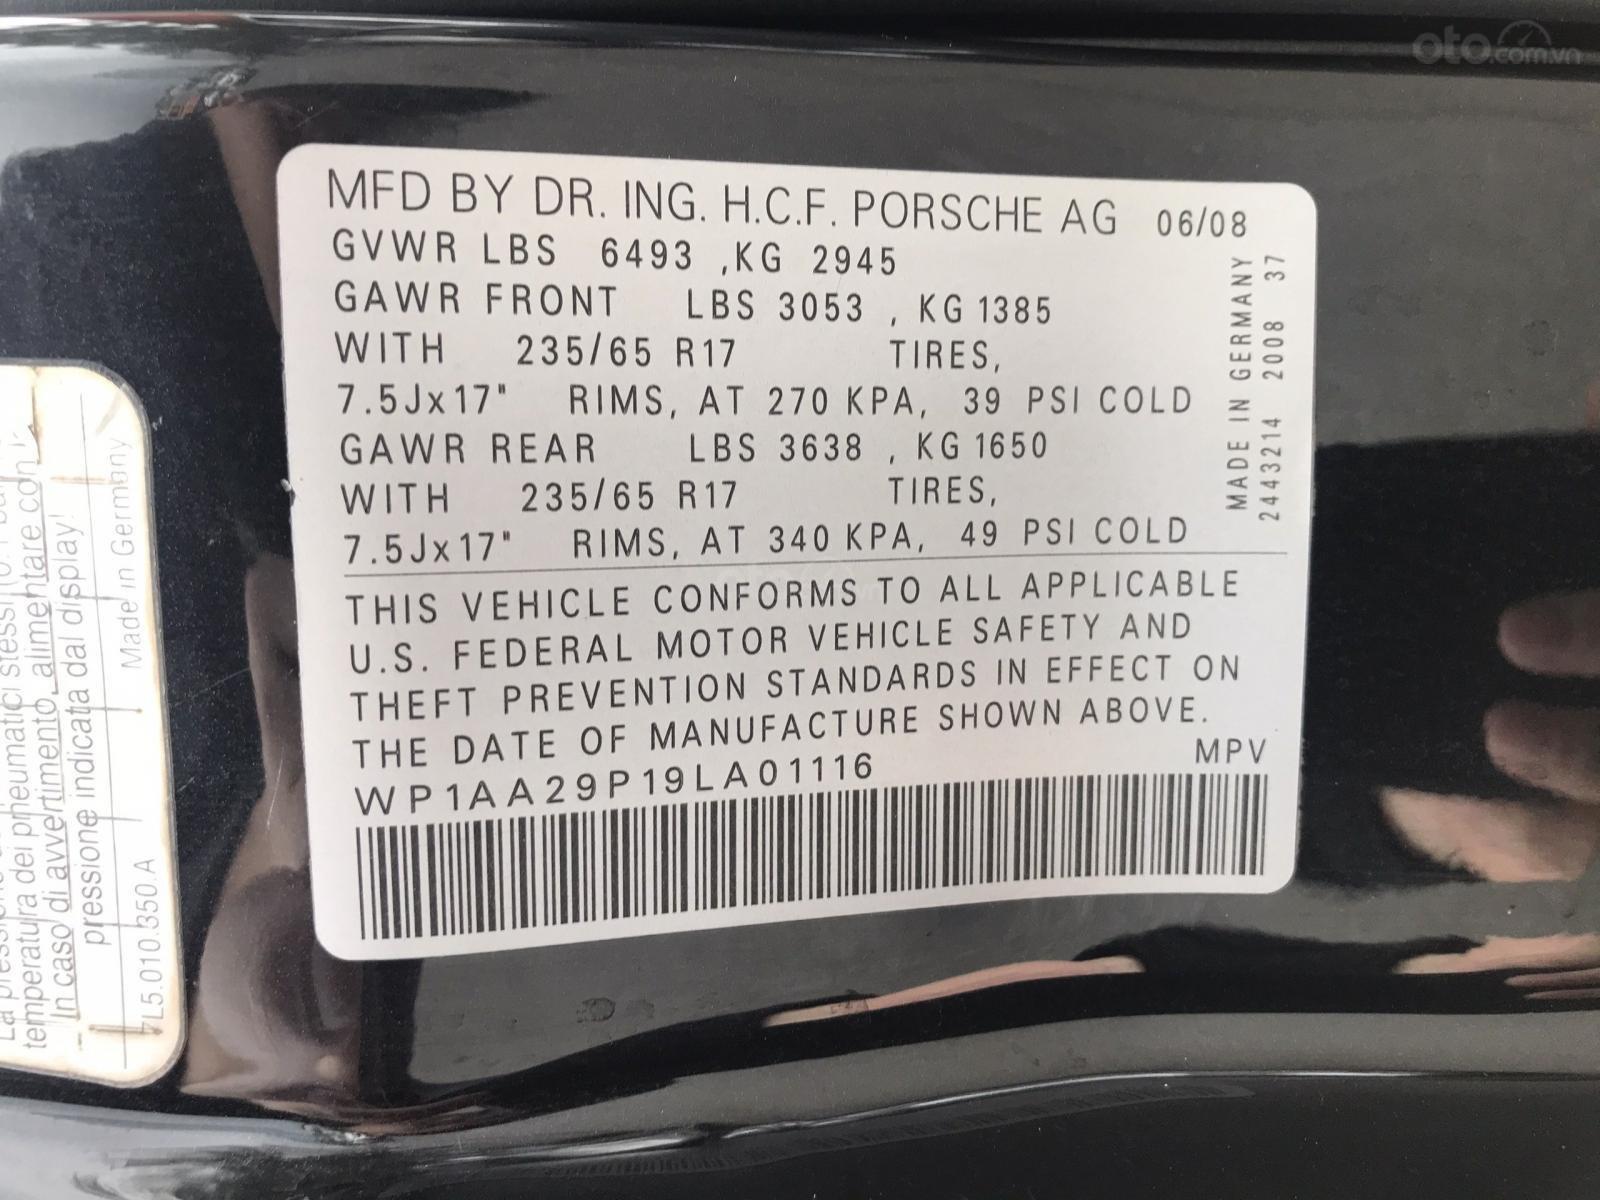 Bán Porsche Cayenne S sản xuất năm 2008 (13)